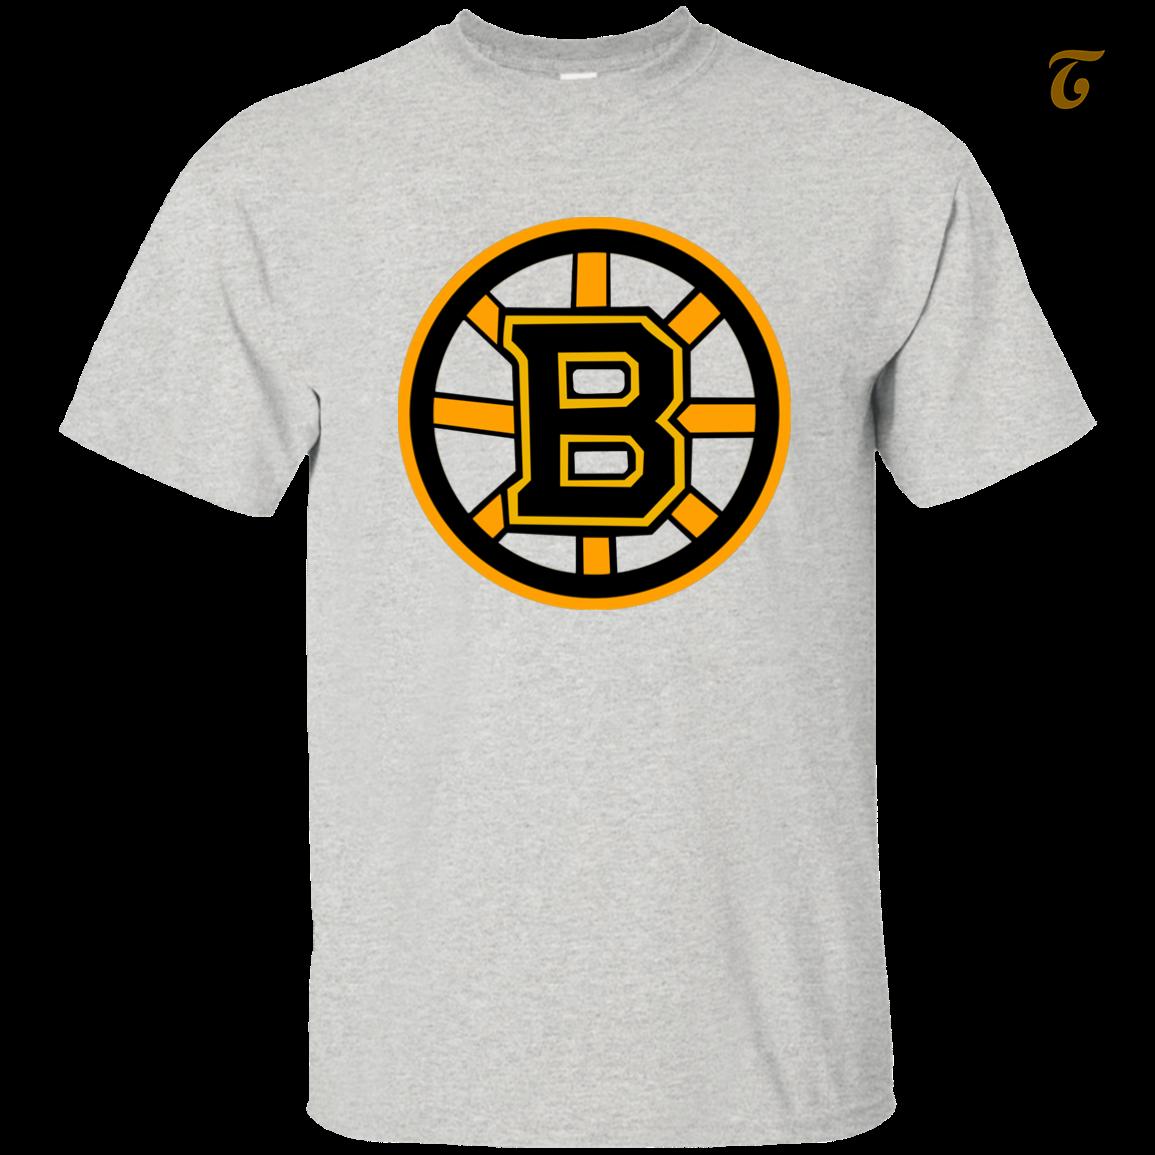 Boston, Burins, Hockey, Team, Men's T shirt - Ash